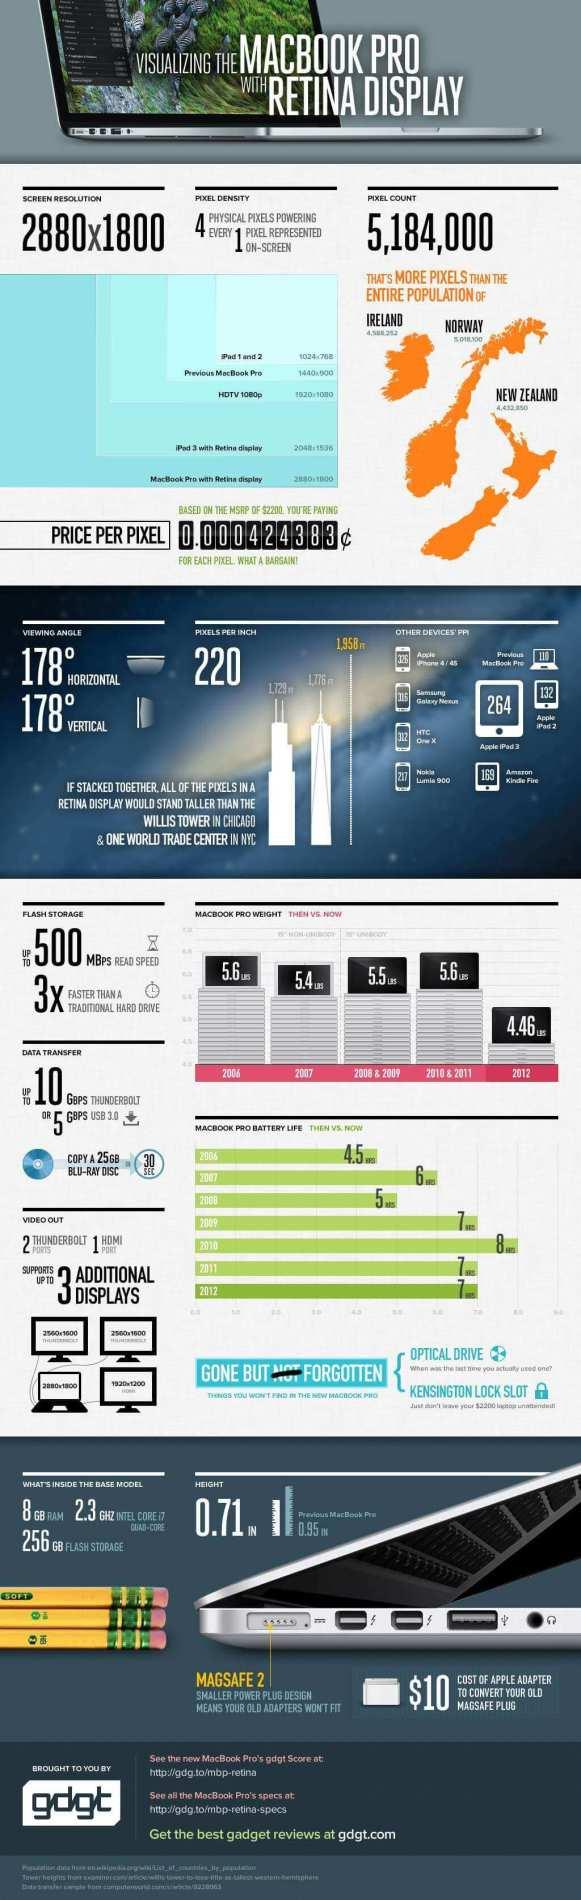 Infographic-Macbook-Pro-retina